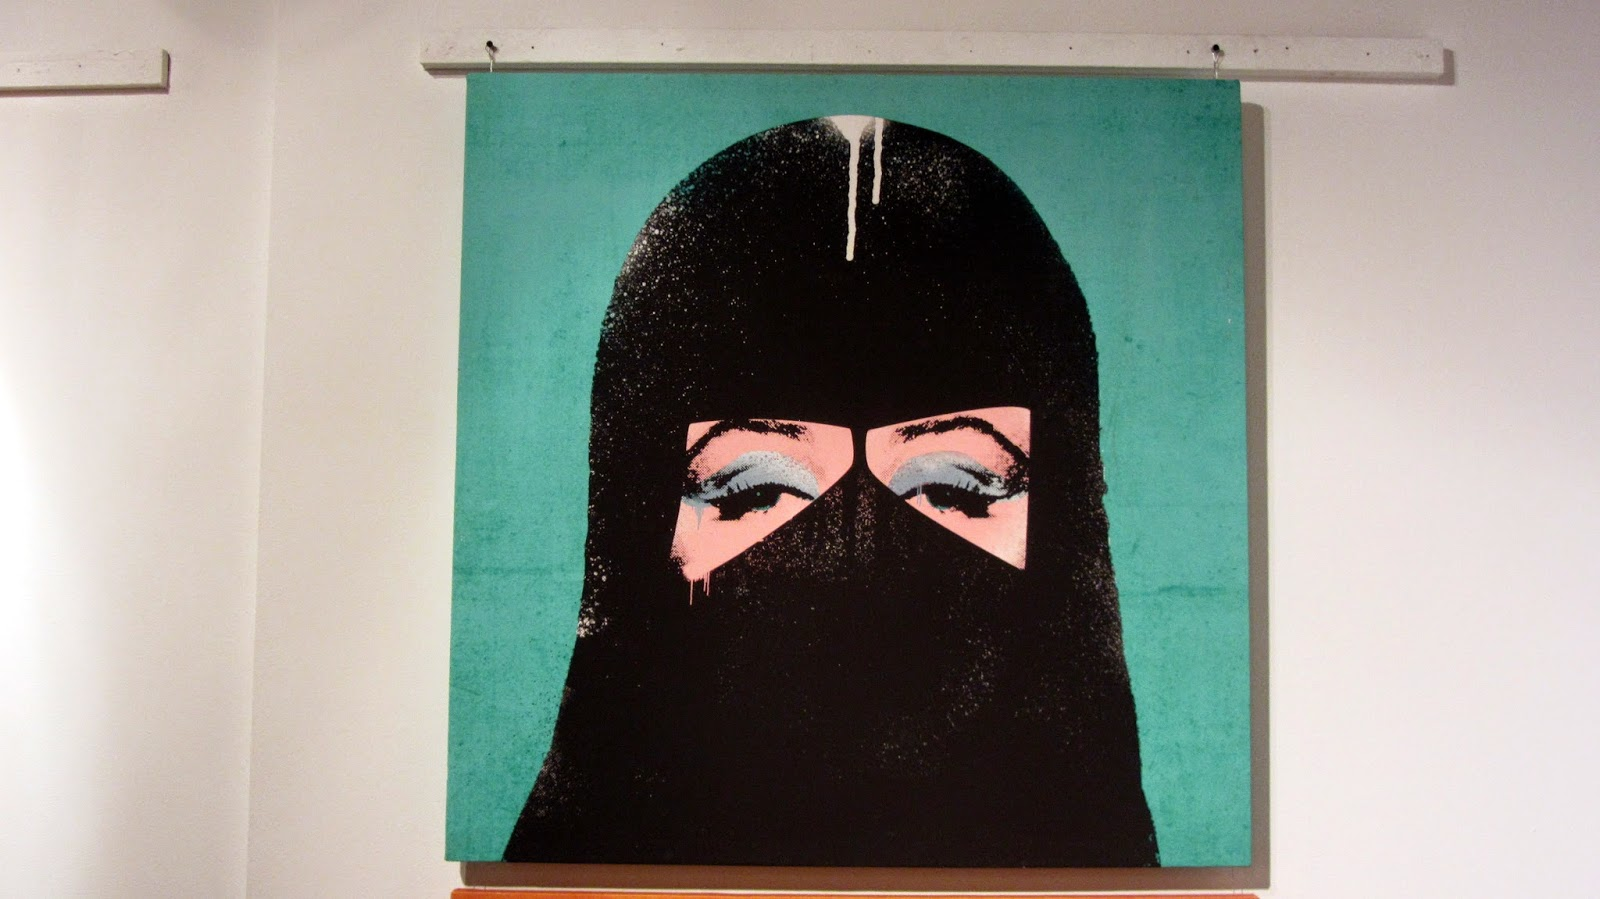 Ali Cha'aban Desert Designs art gallery Khobar Saudi Arabia blog